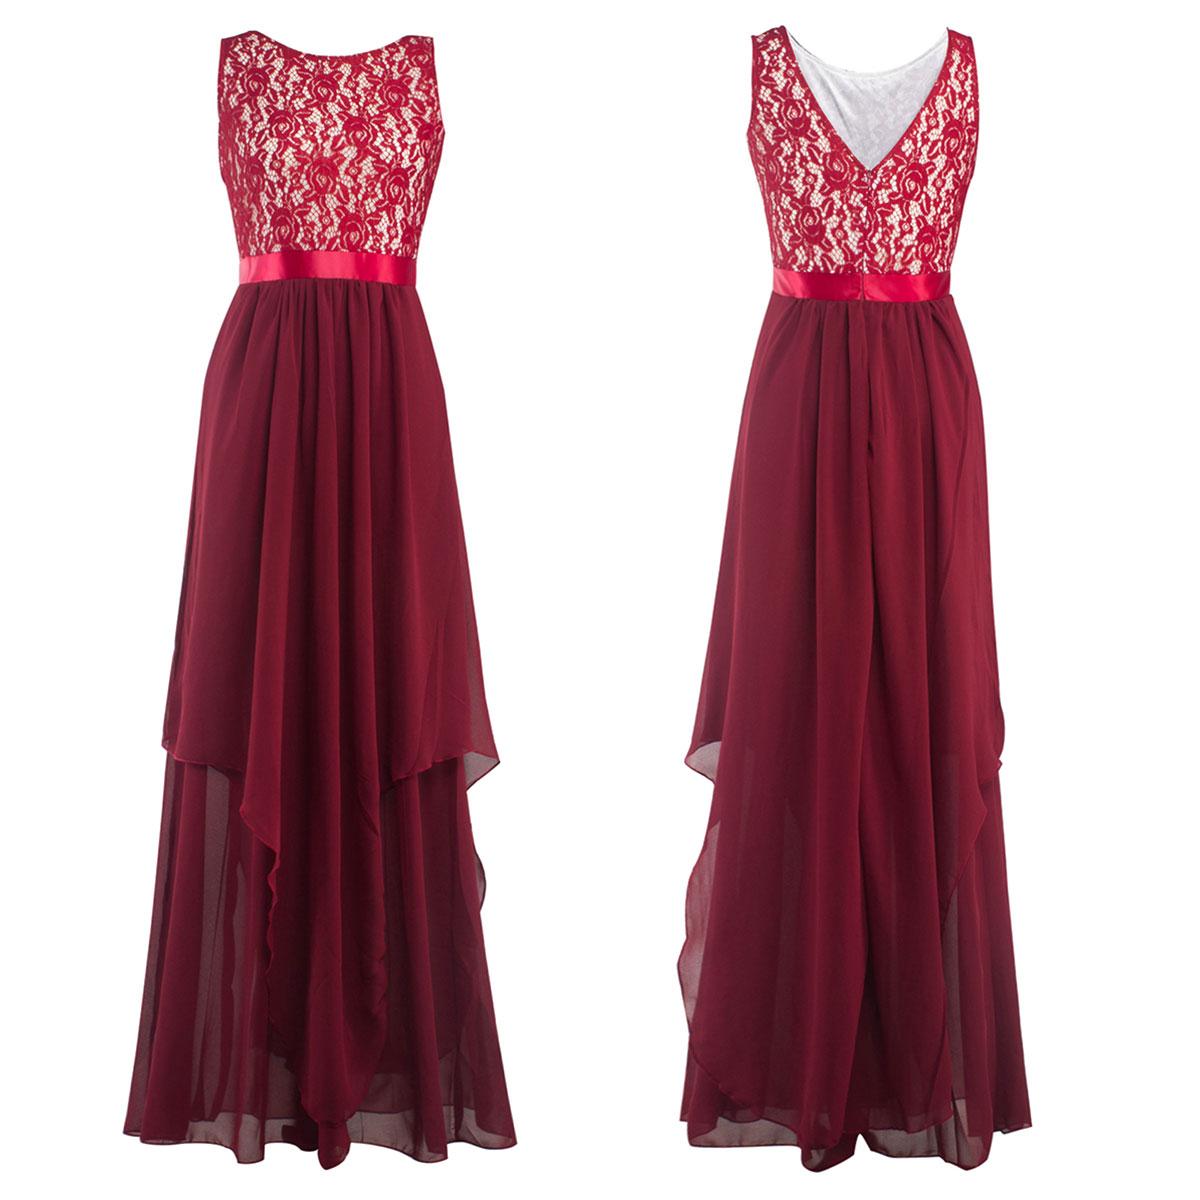 ebay formal applique chiffon prom ball gown evening